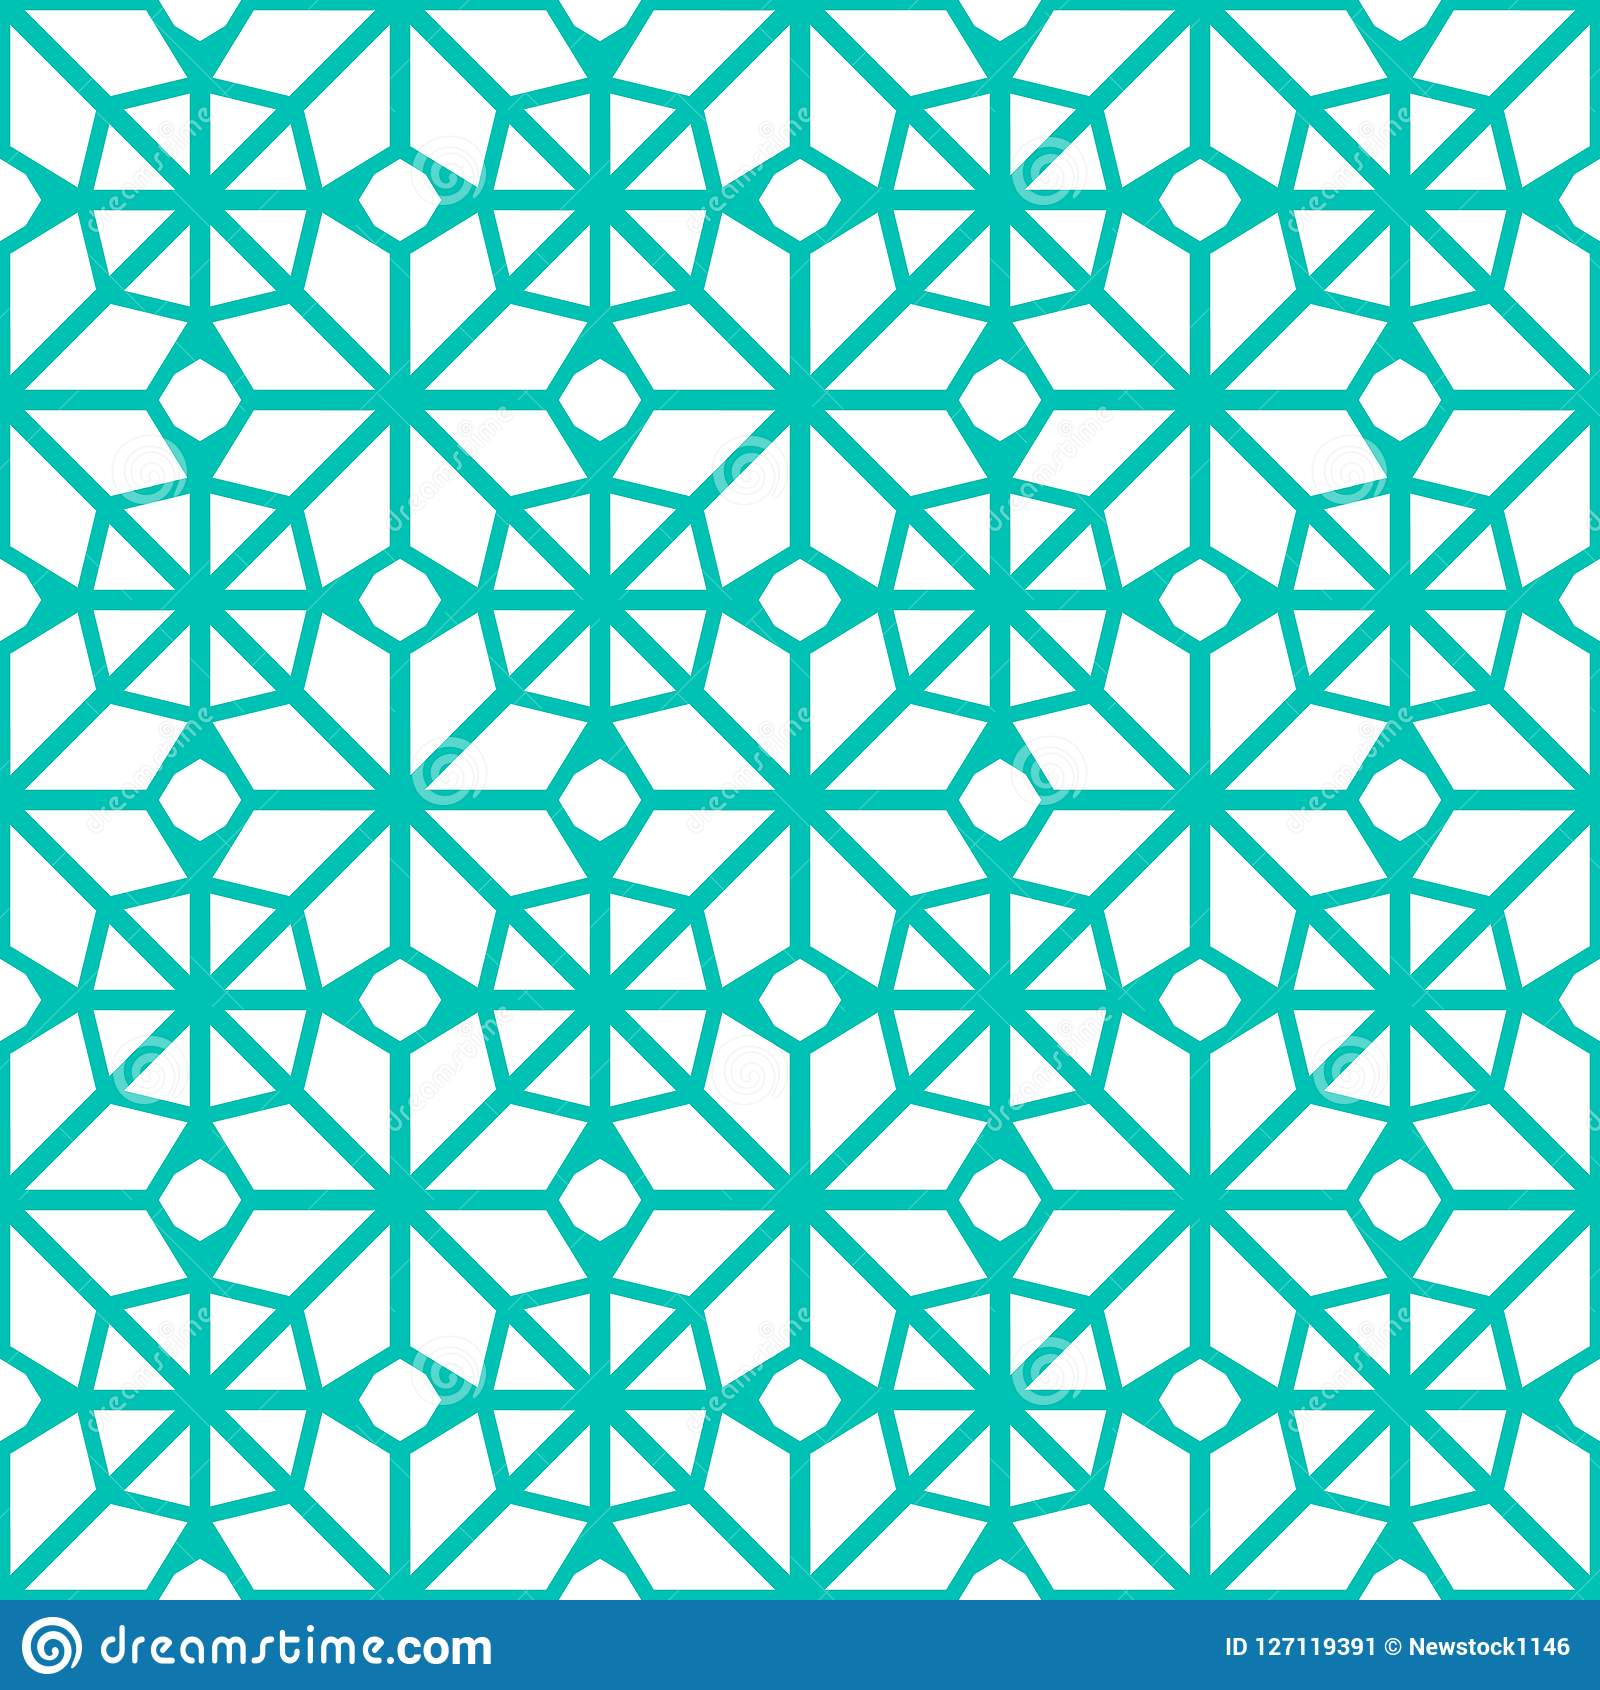 cc553fcbfe89 Islamic geometric background. Arabic seamless pattern. Vector eastern  texture. Asian decor. Endless